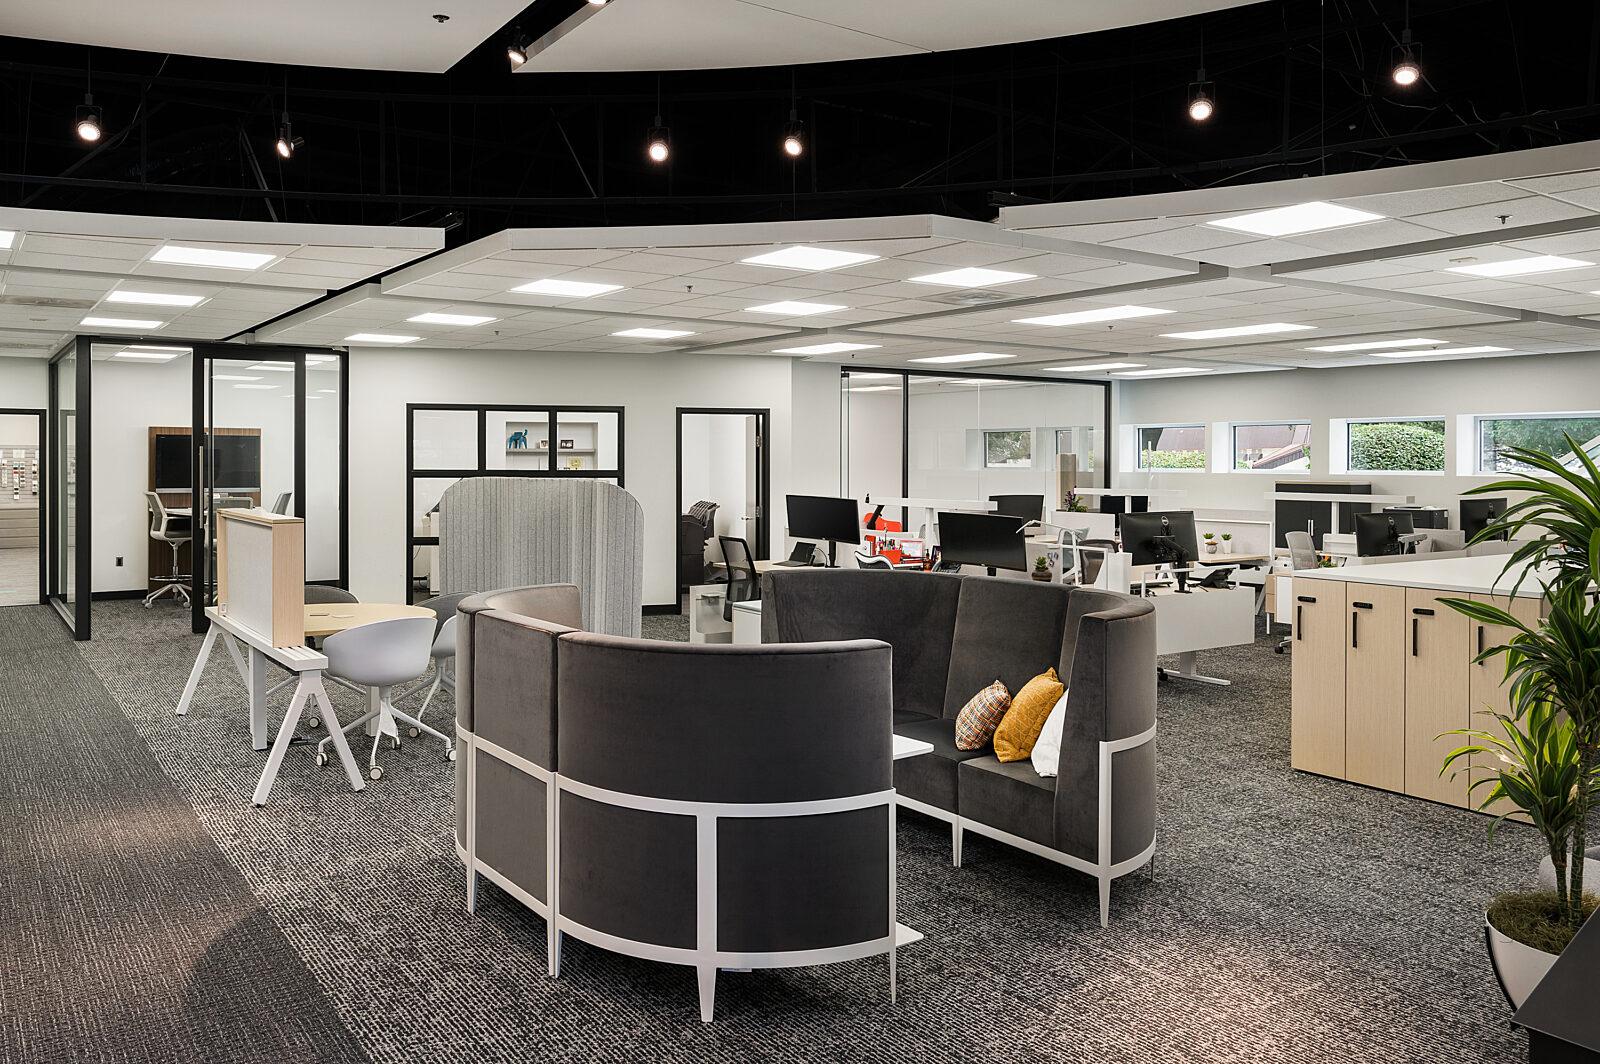 Design area ancillary furniture